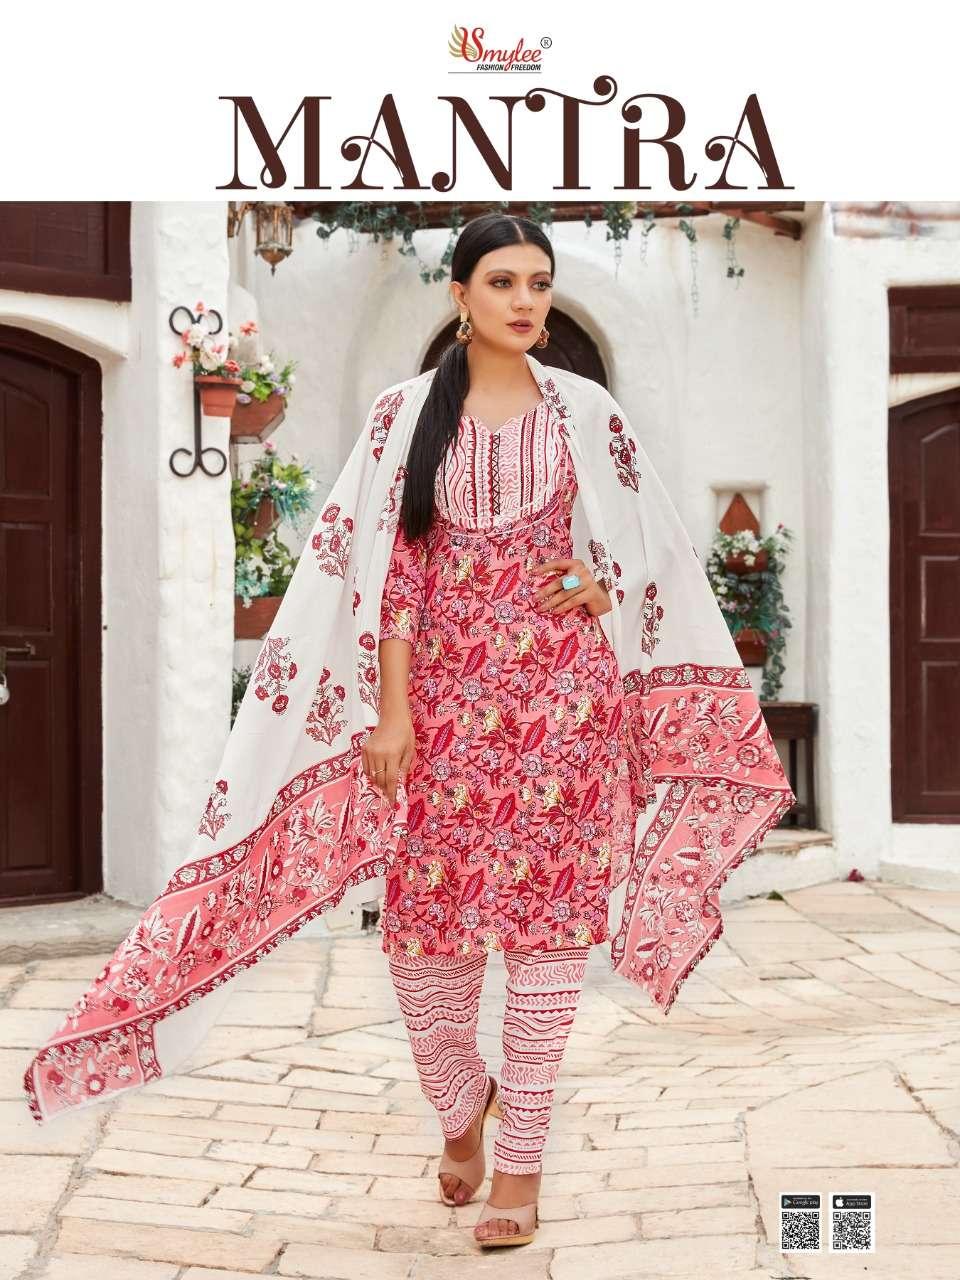 rung present mantra printed rayon full stitch top bottom and dupatta